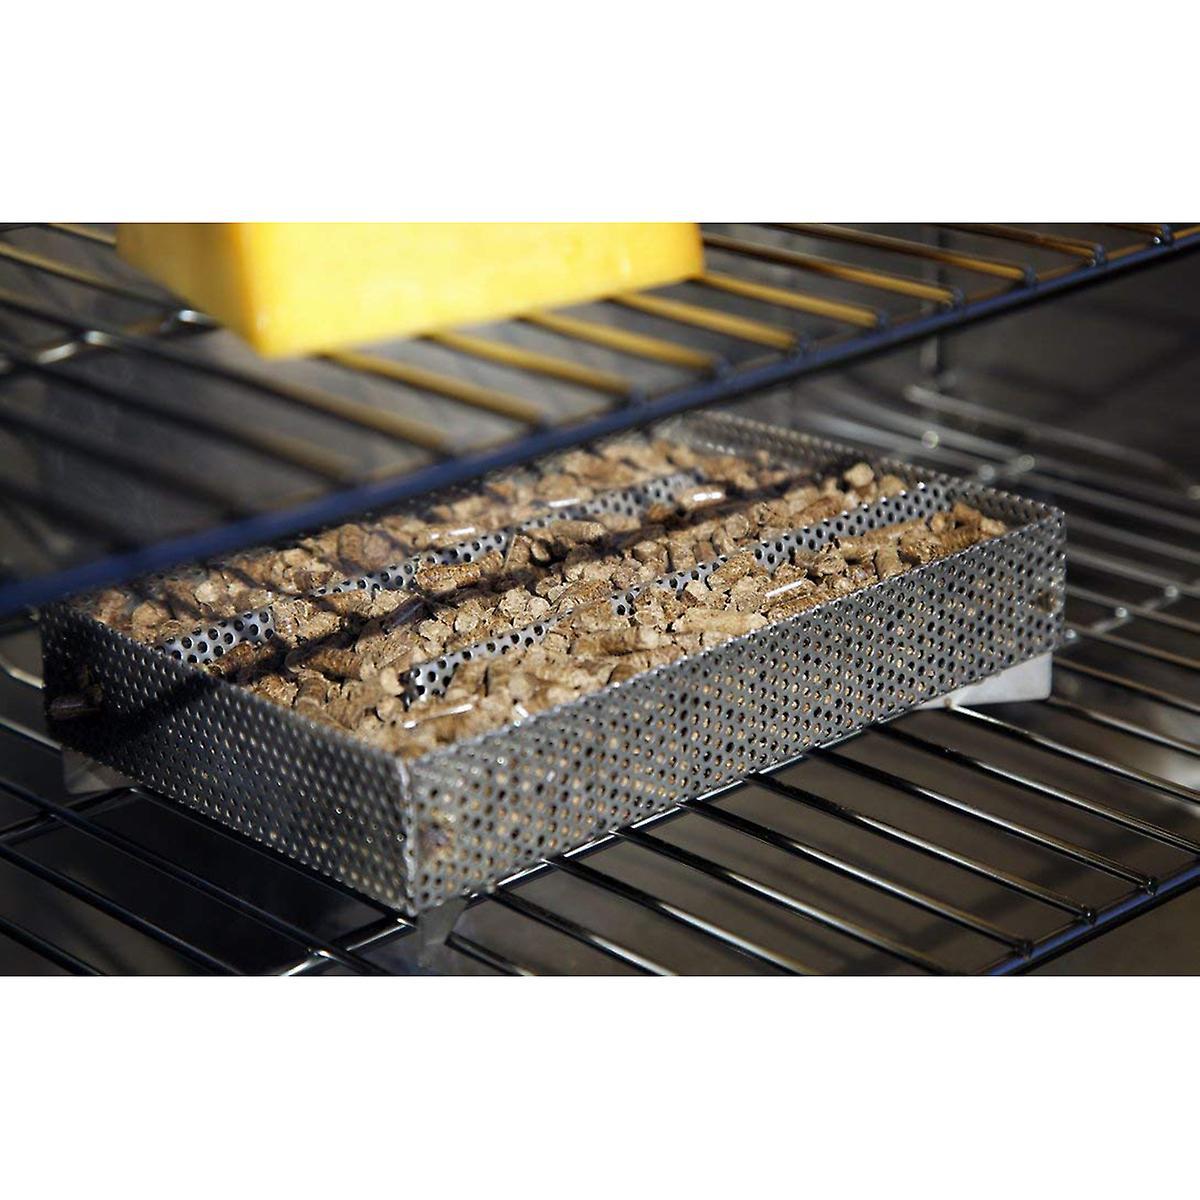 A-MAZE-N 2 lb. Premium Wood BBQ Pellets Amazen AMNP2-SPL-0018 - Italian Spice